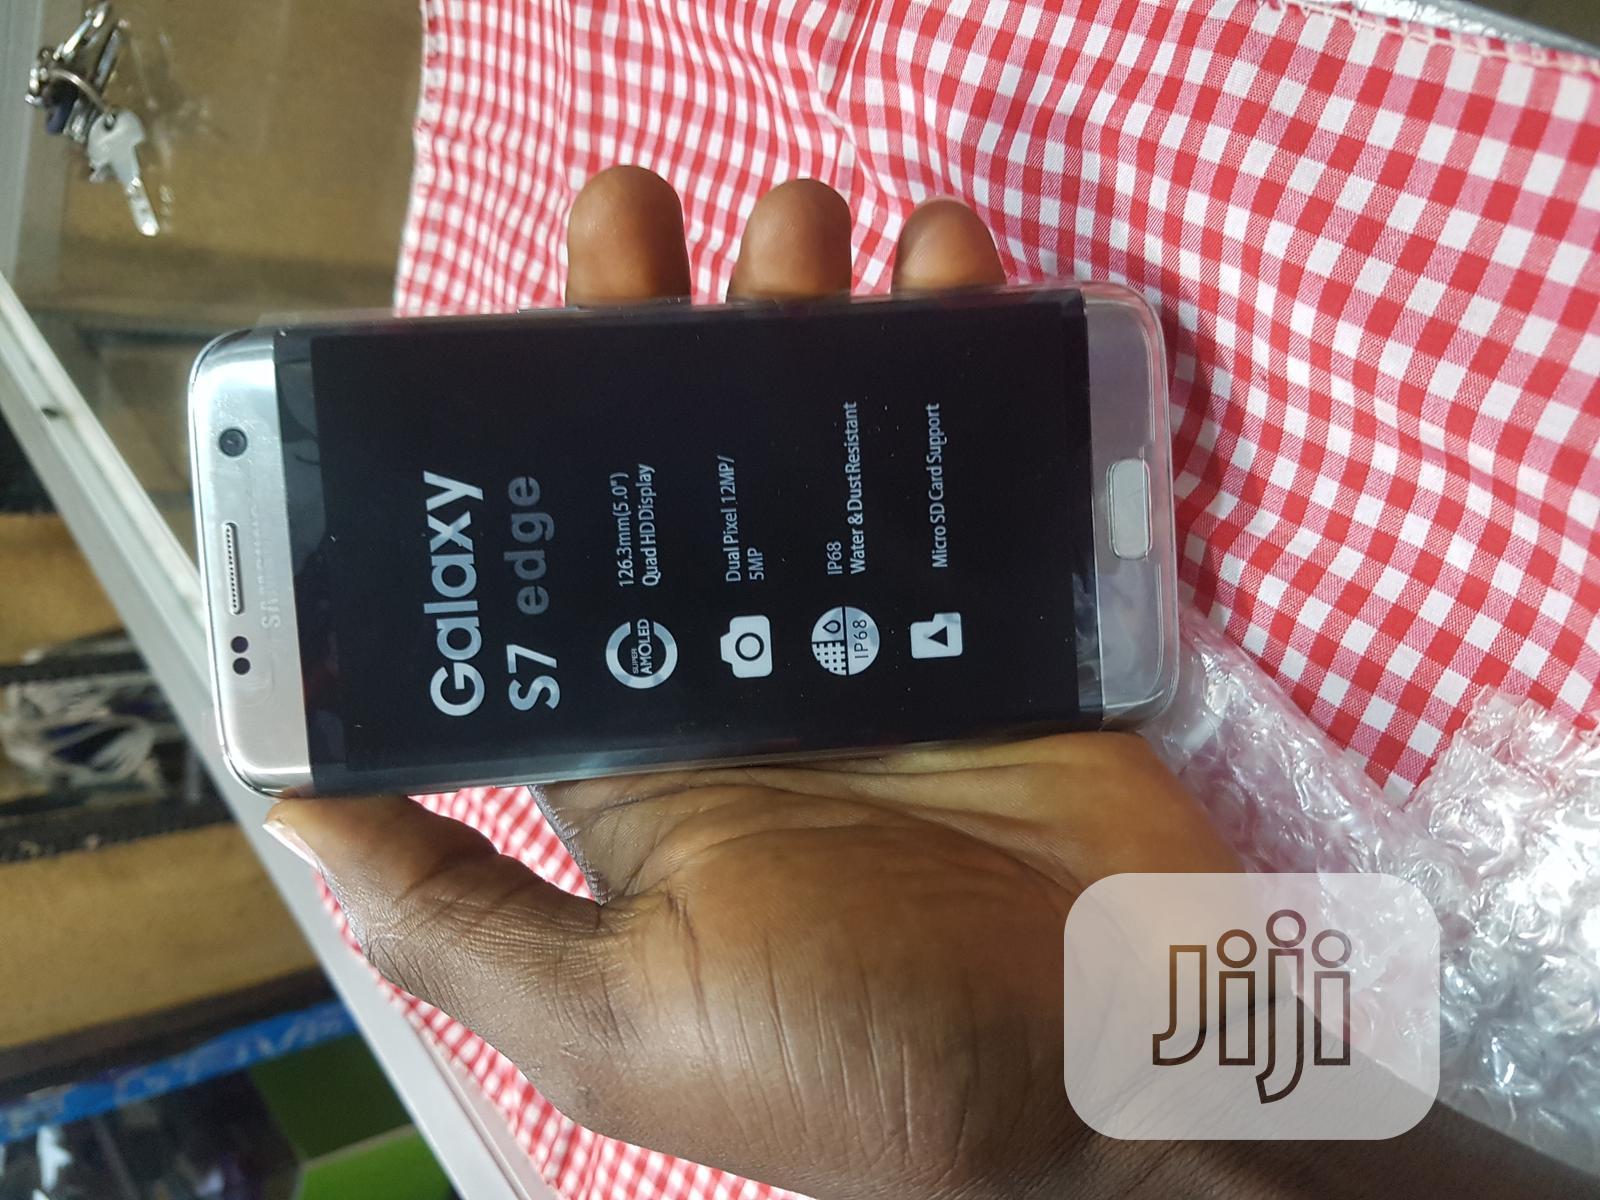 Samsung Galaxy S7 edge 32 GB | Mobile Phones for sale in Ikeja, Lagos State, Nigeria